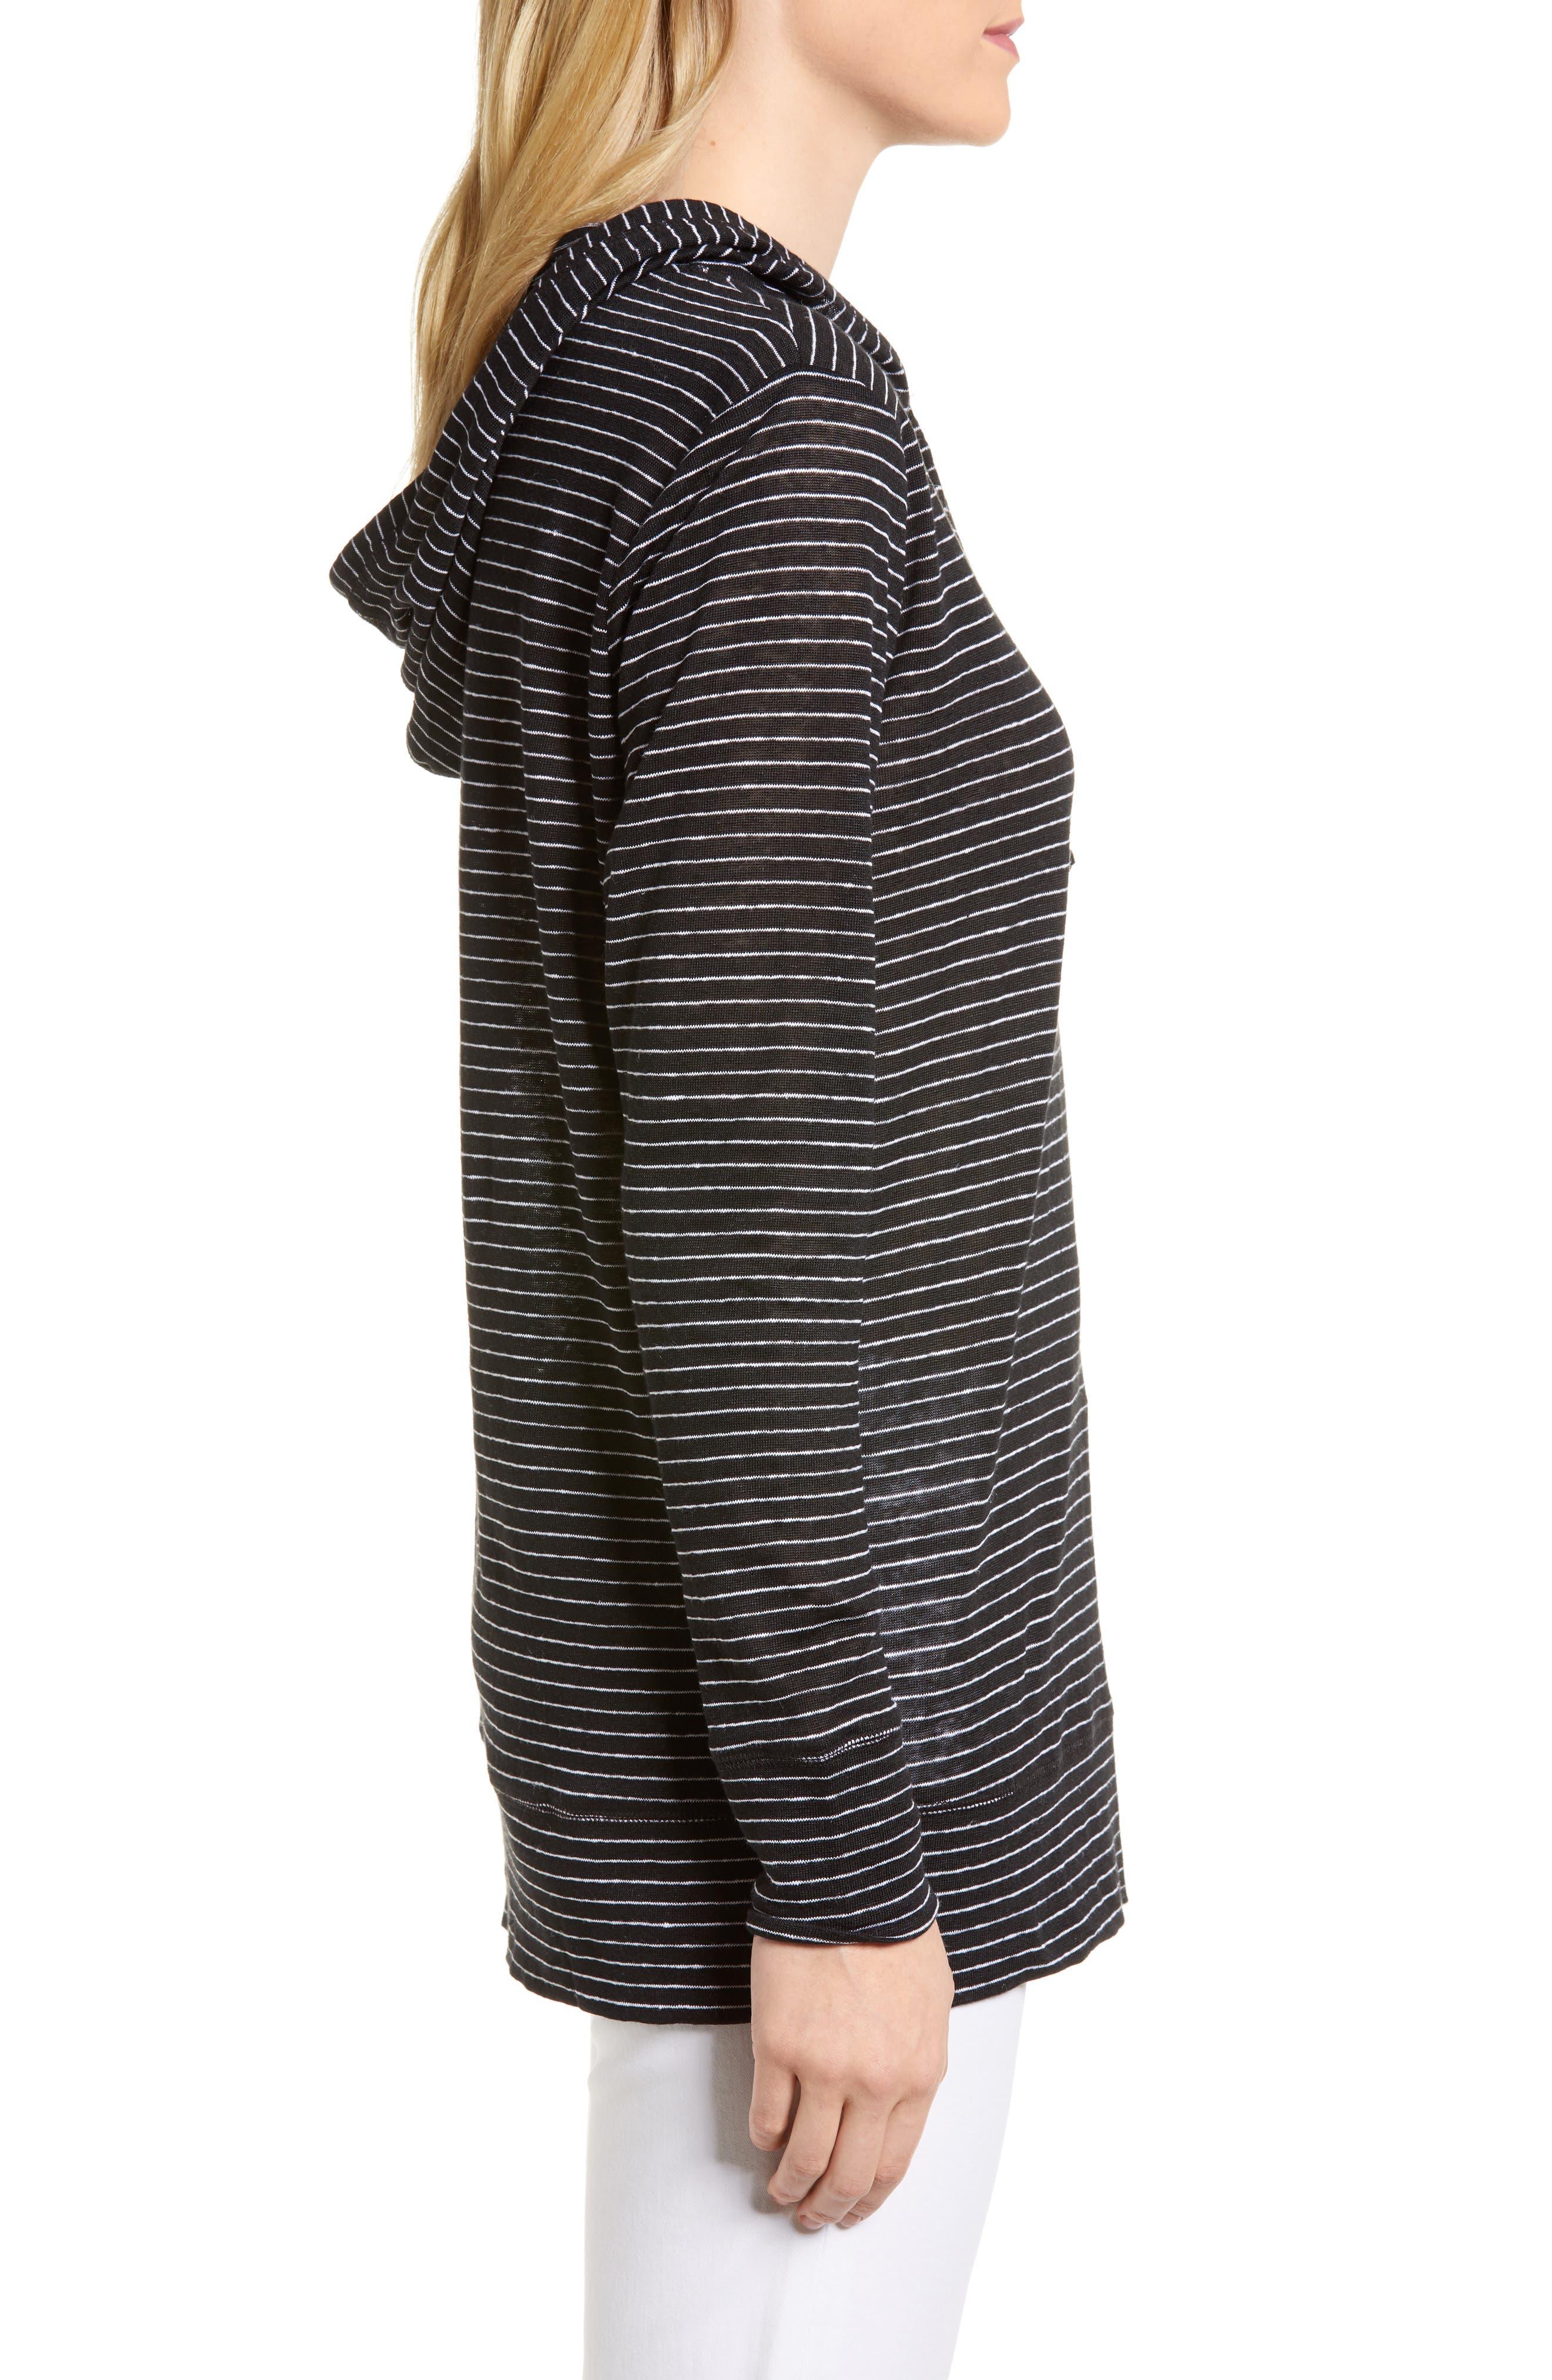 Knit Linen Hoodie,                             Alternate thumbnail 3, color,                             BLACK- IVORY SKINNY STRIPE